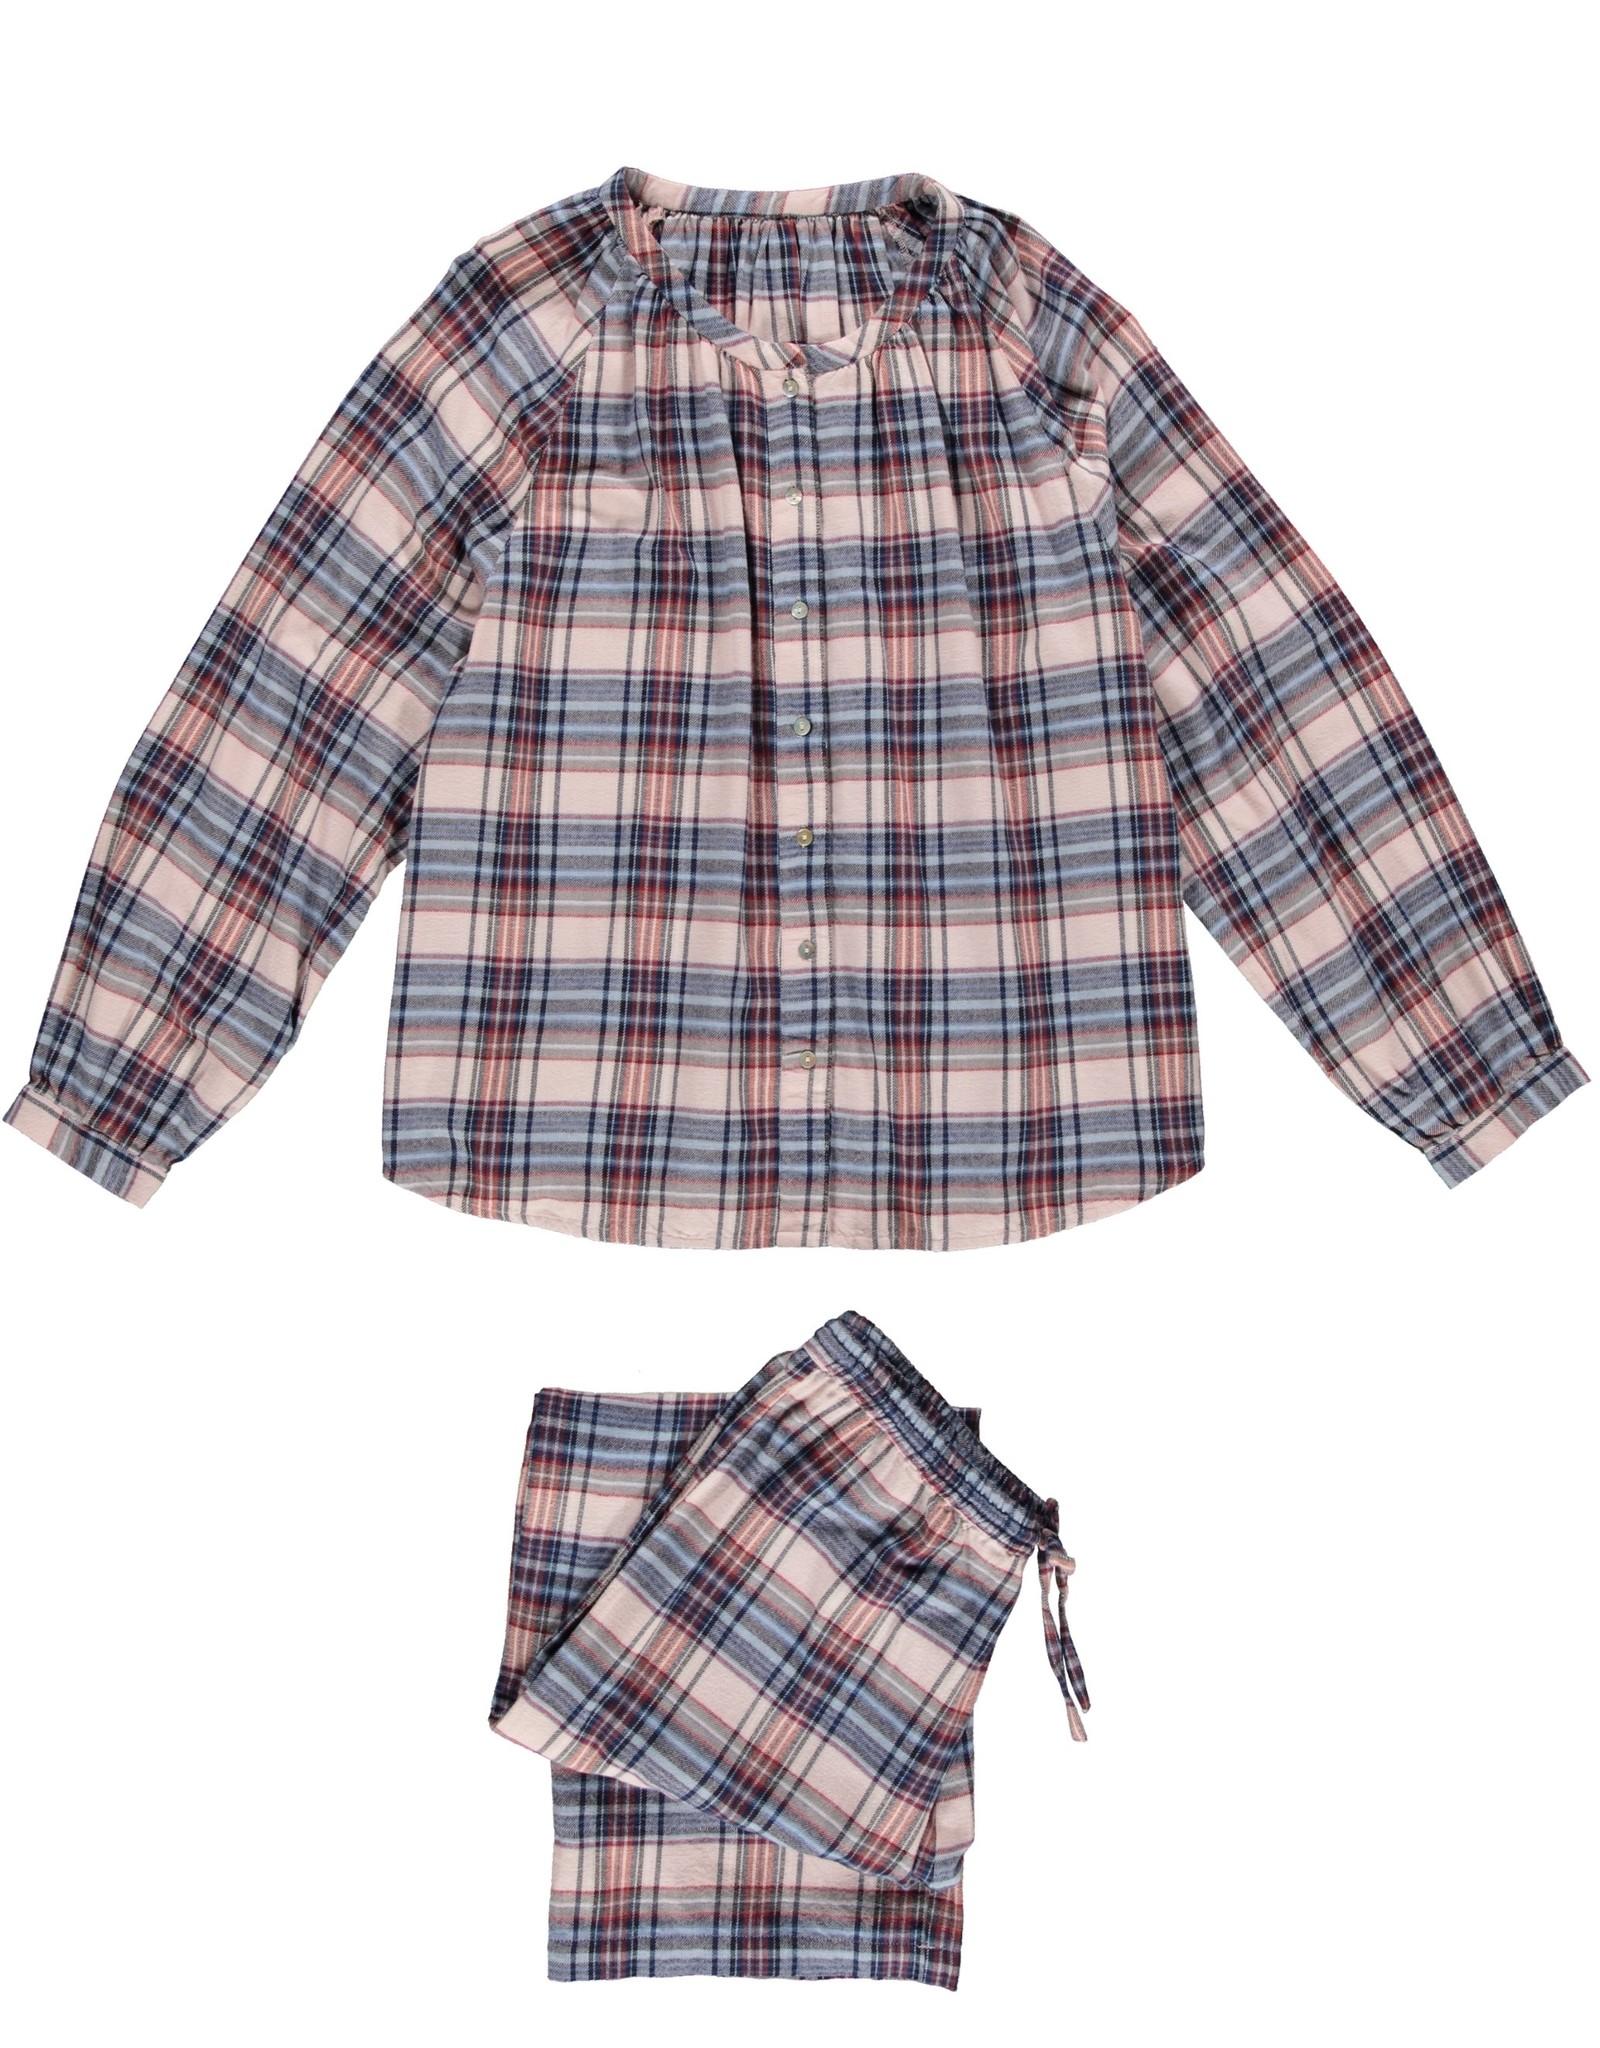 Dorélit Fynn + Alkes | Pajama Set Woven | Check Amber